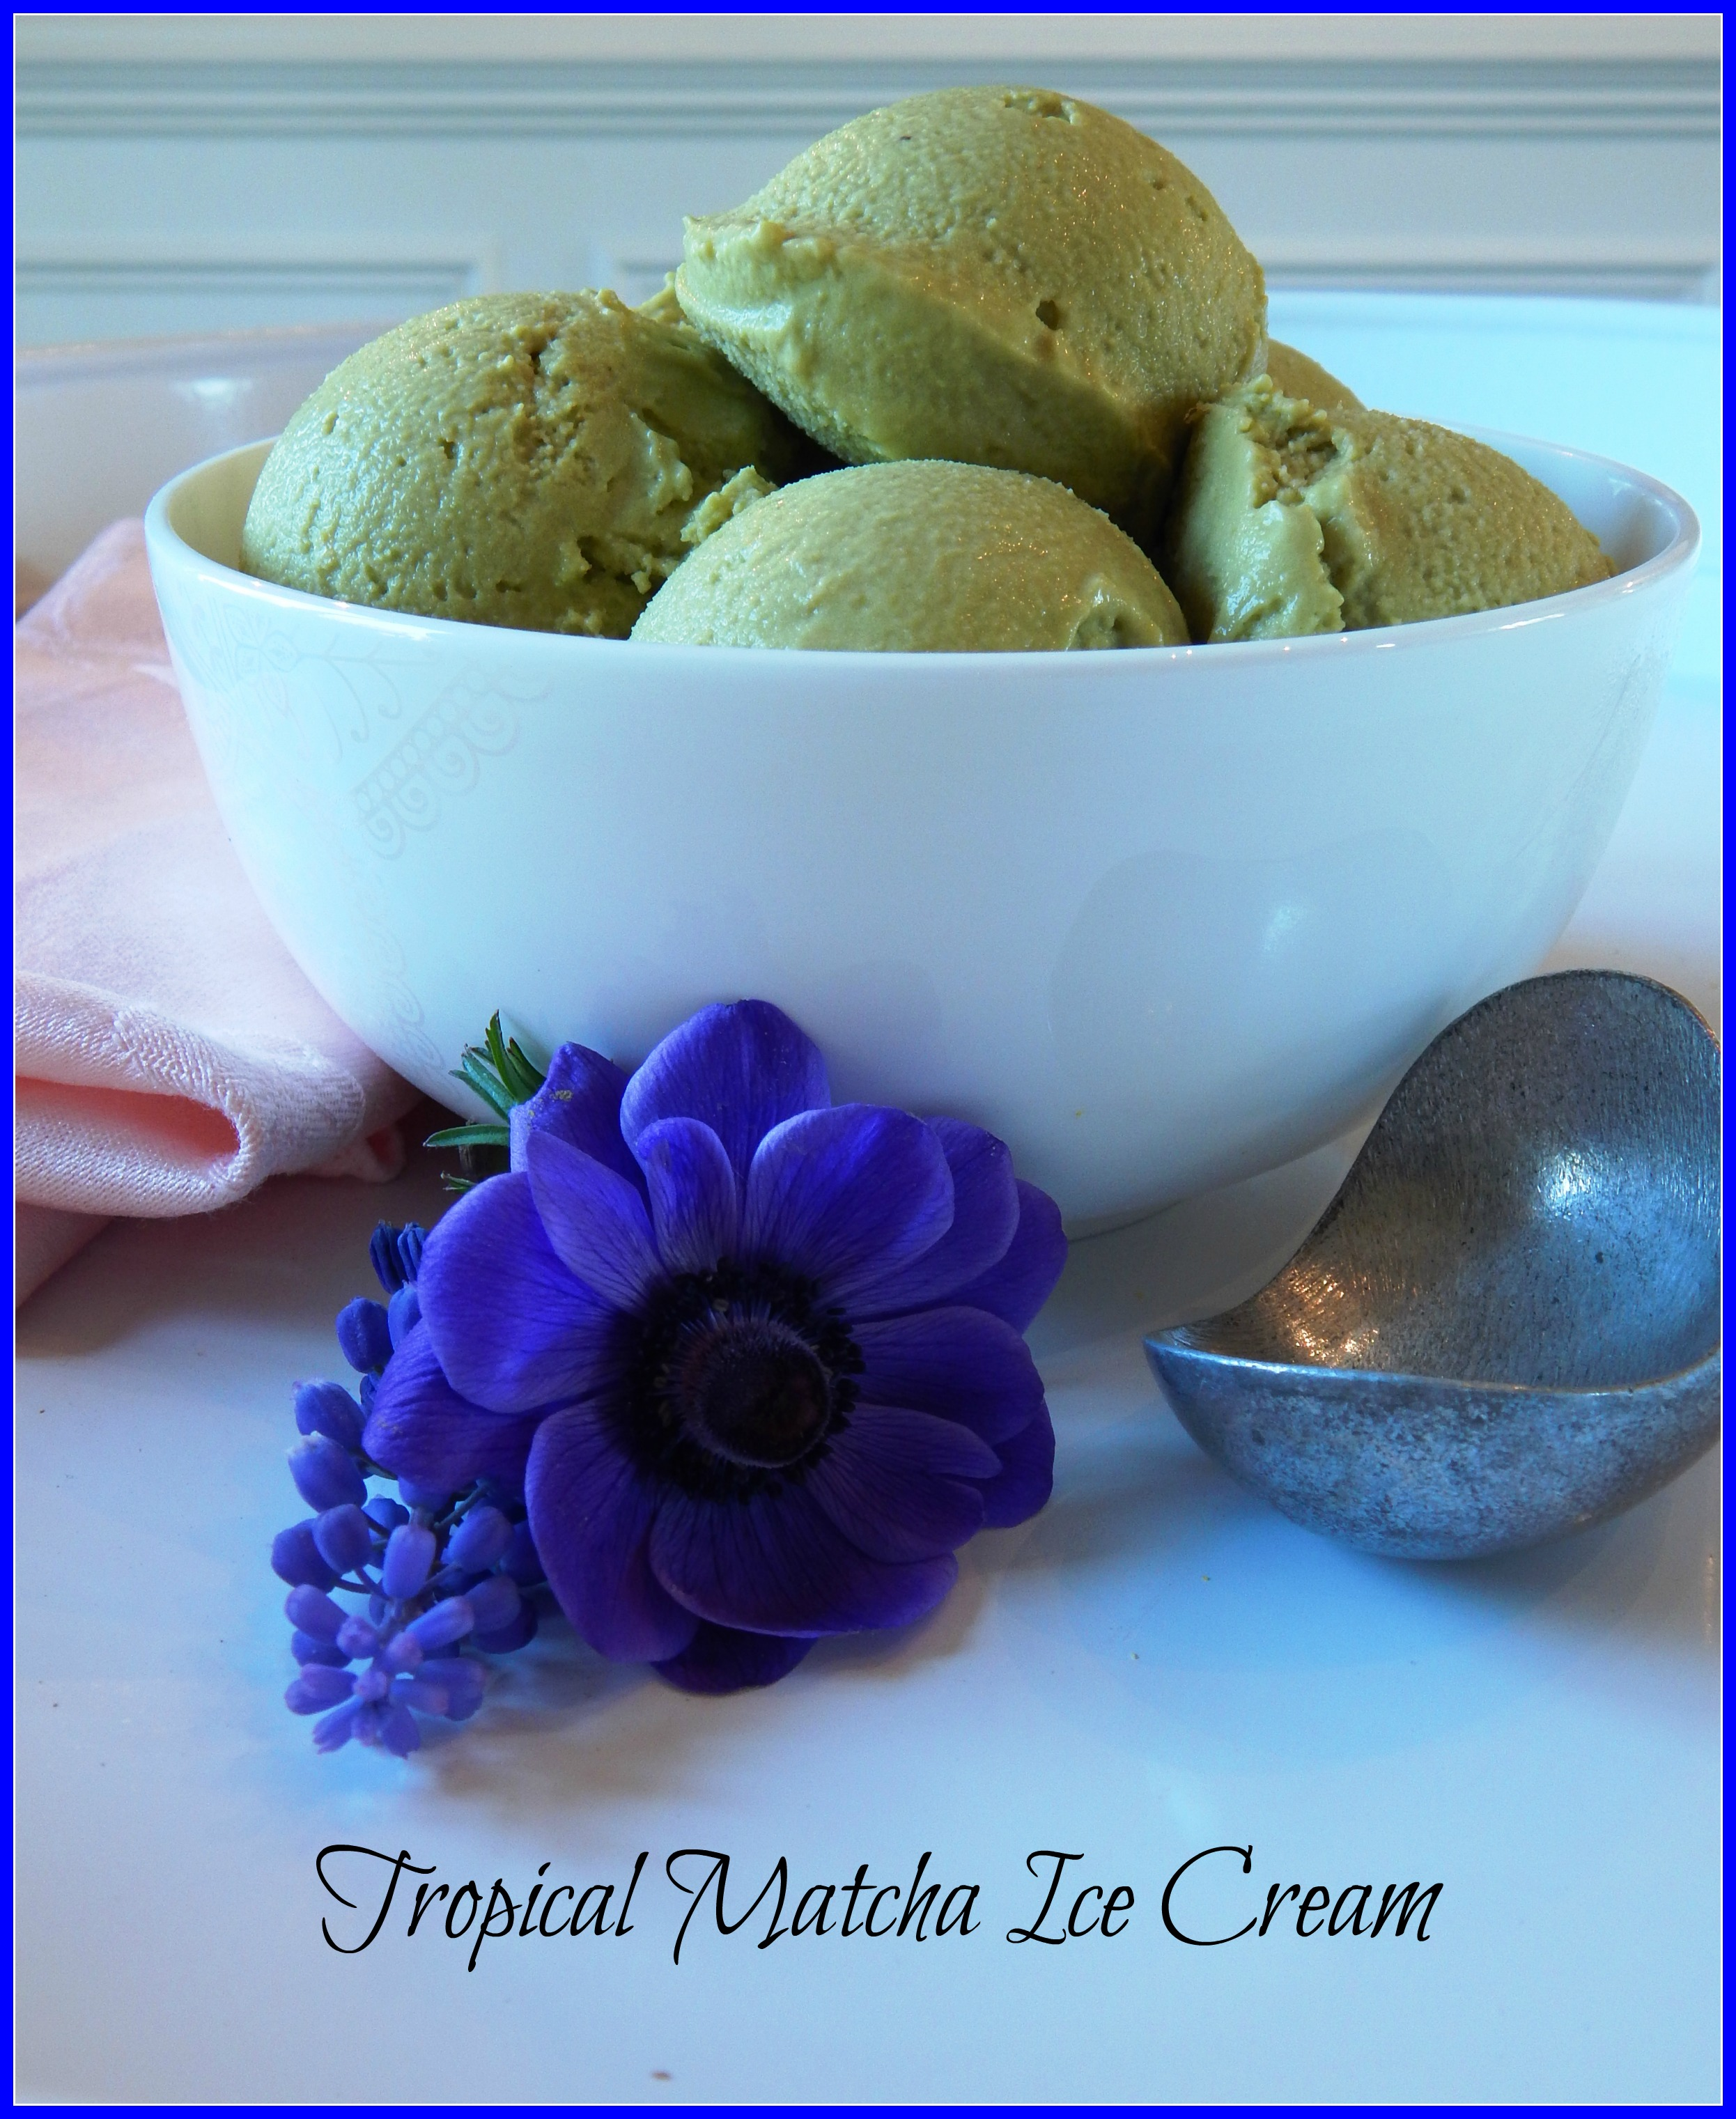 Tropical Matcha Ice Cream